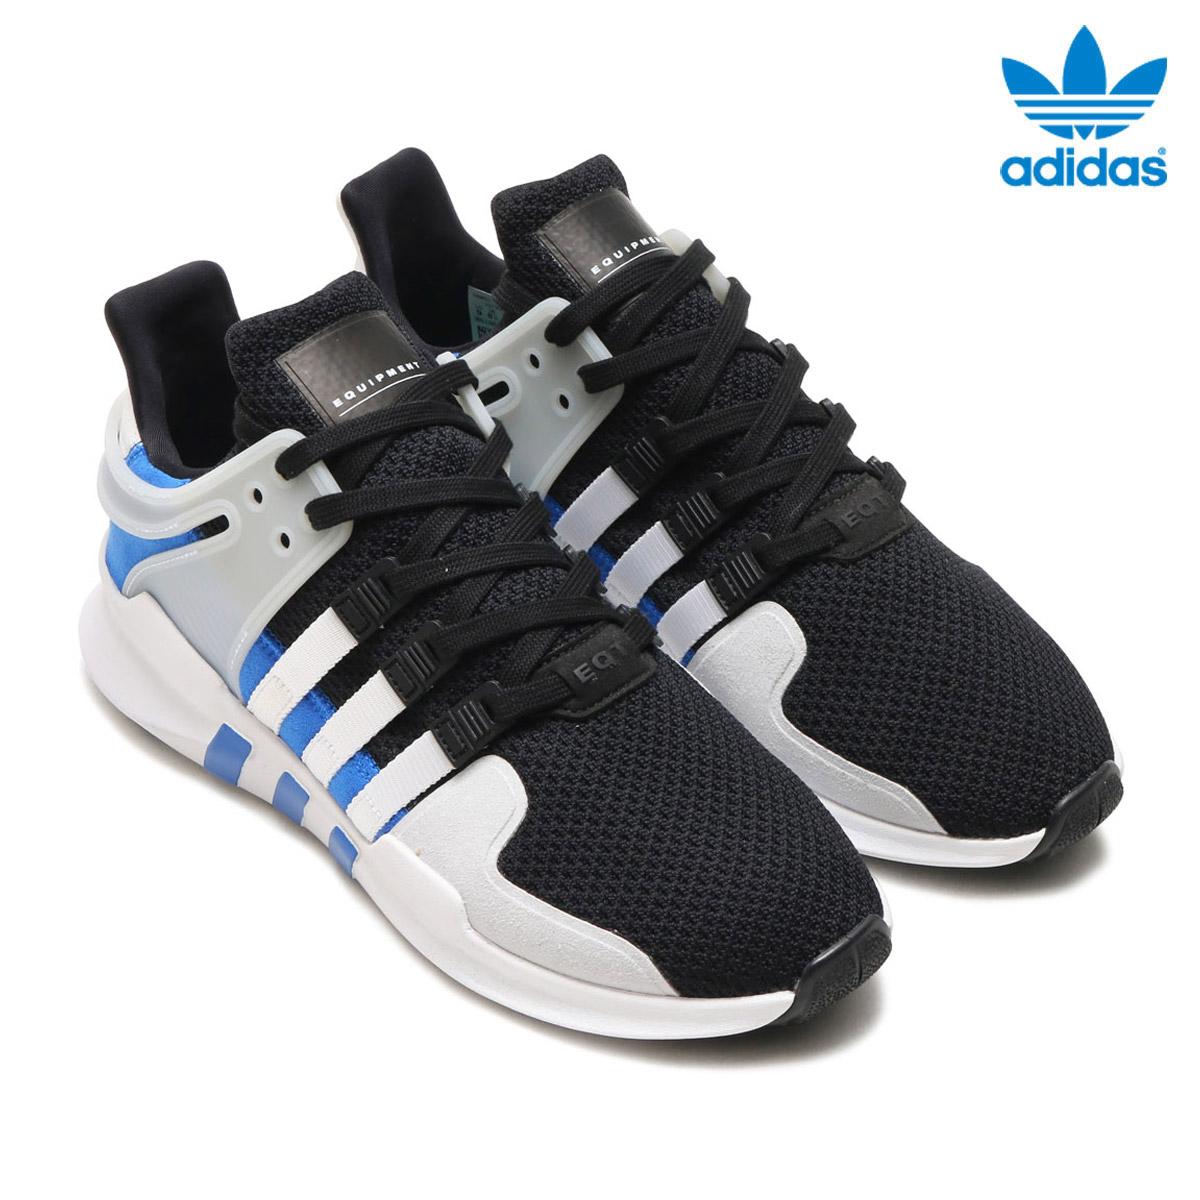 info for 052a9 8e641 adidas Originals EQT SUPPORTADV (Adidas EQT support ADV) (black) 17FW-S